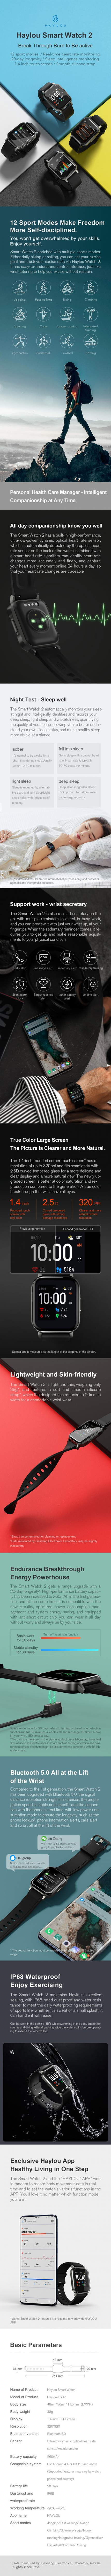 Haylou LS02 Smartwatch A